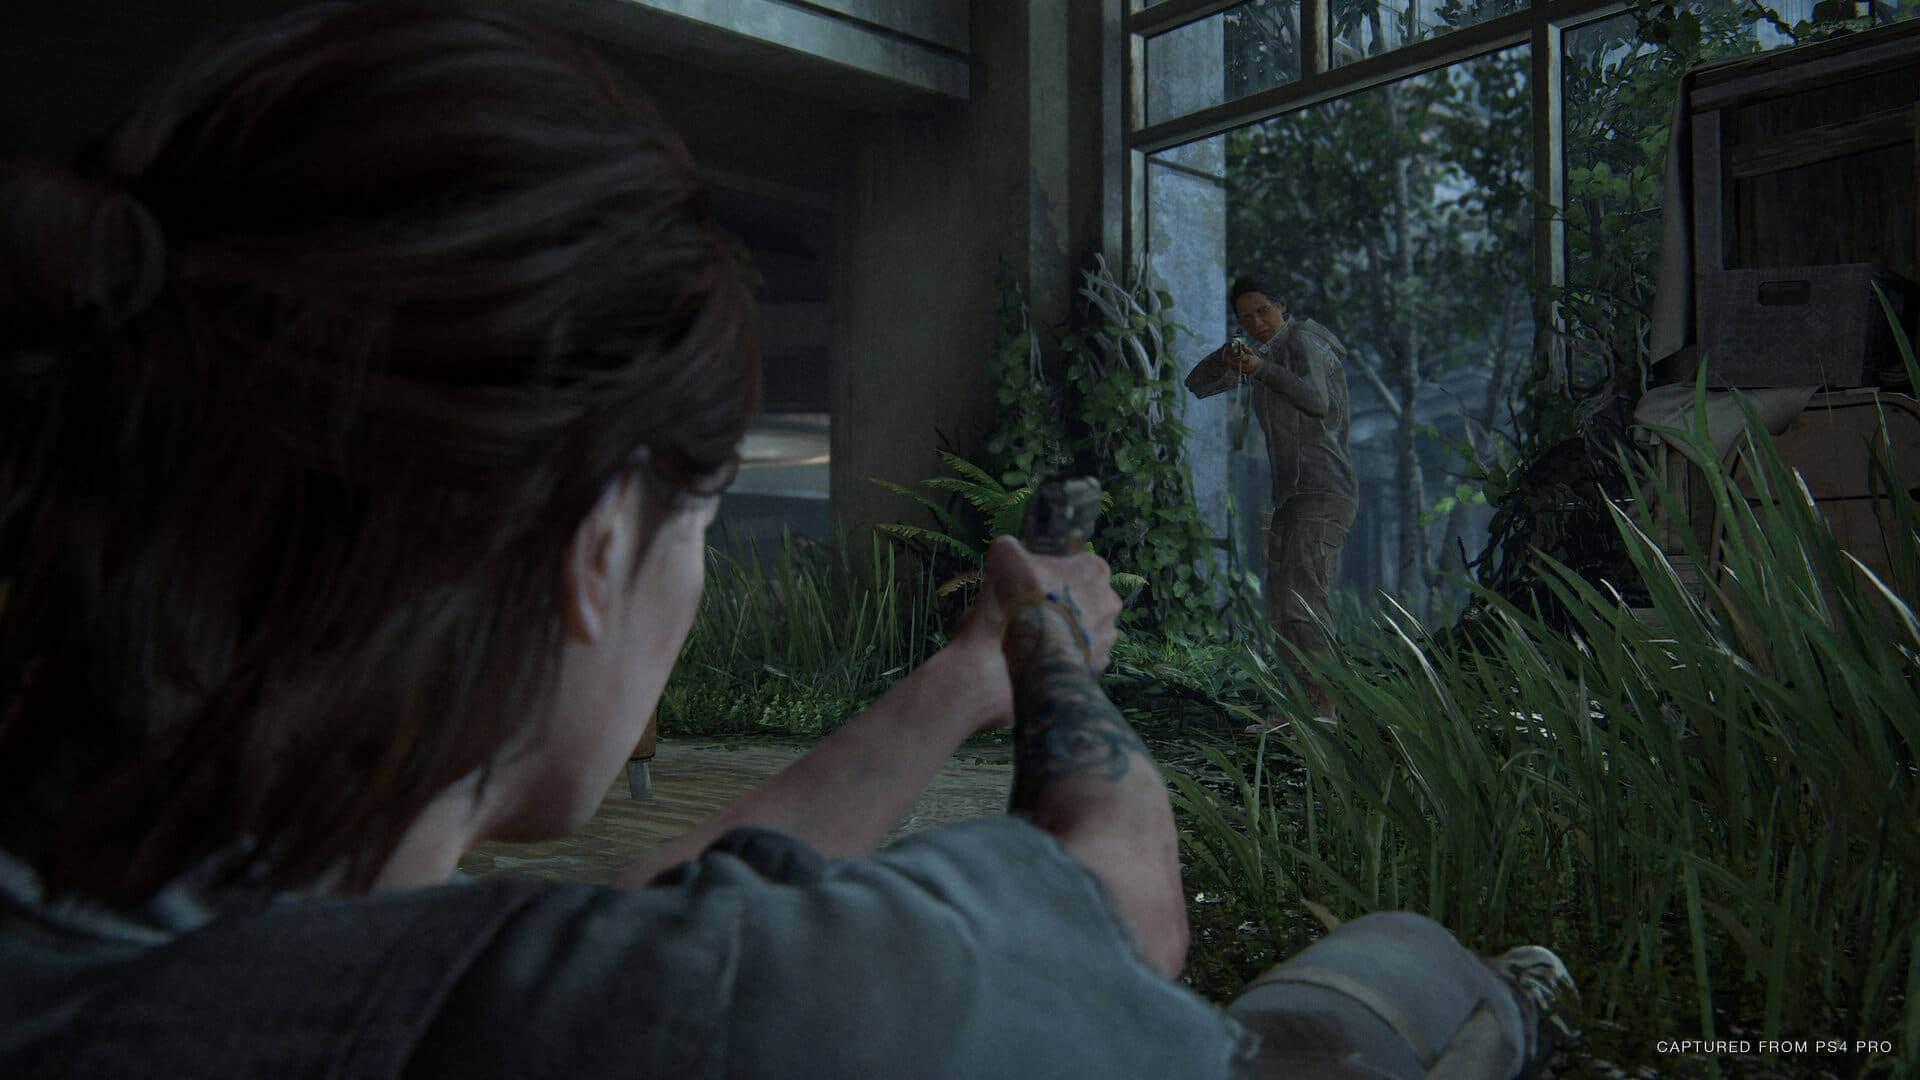 Primeiras Impressões The Last Of Us, Acessibilidade The Last of Us, The Last of Us Part II, Delfos, Naughty Dog, Sony, Análise The Last of Us 2